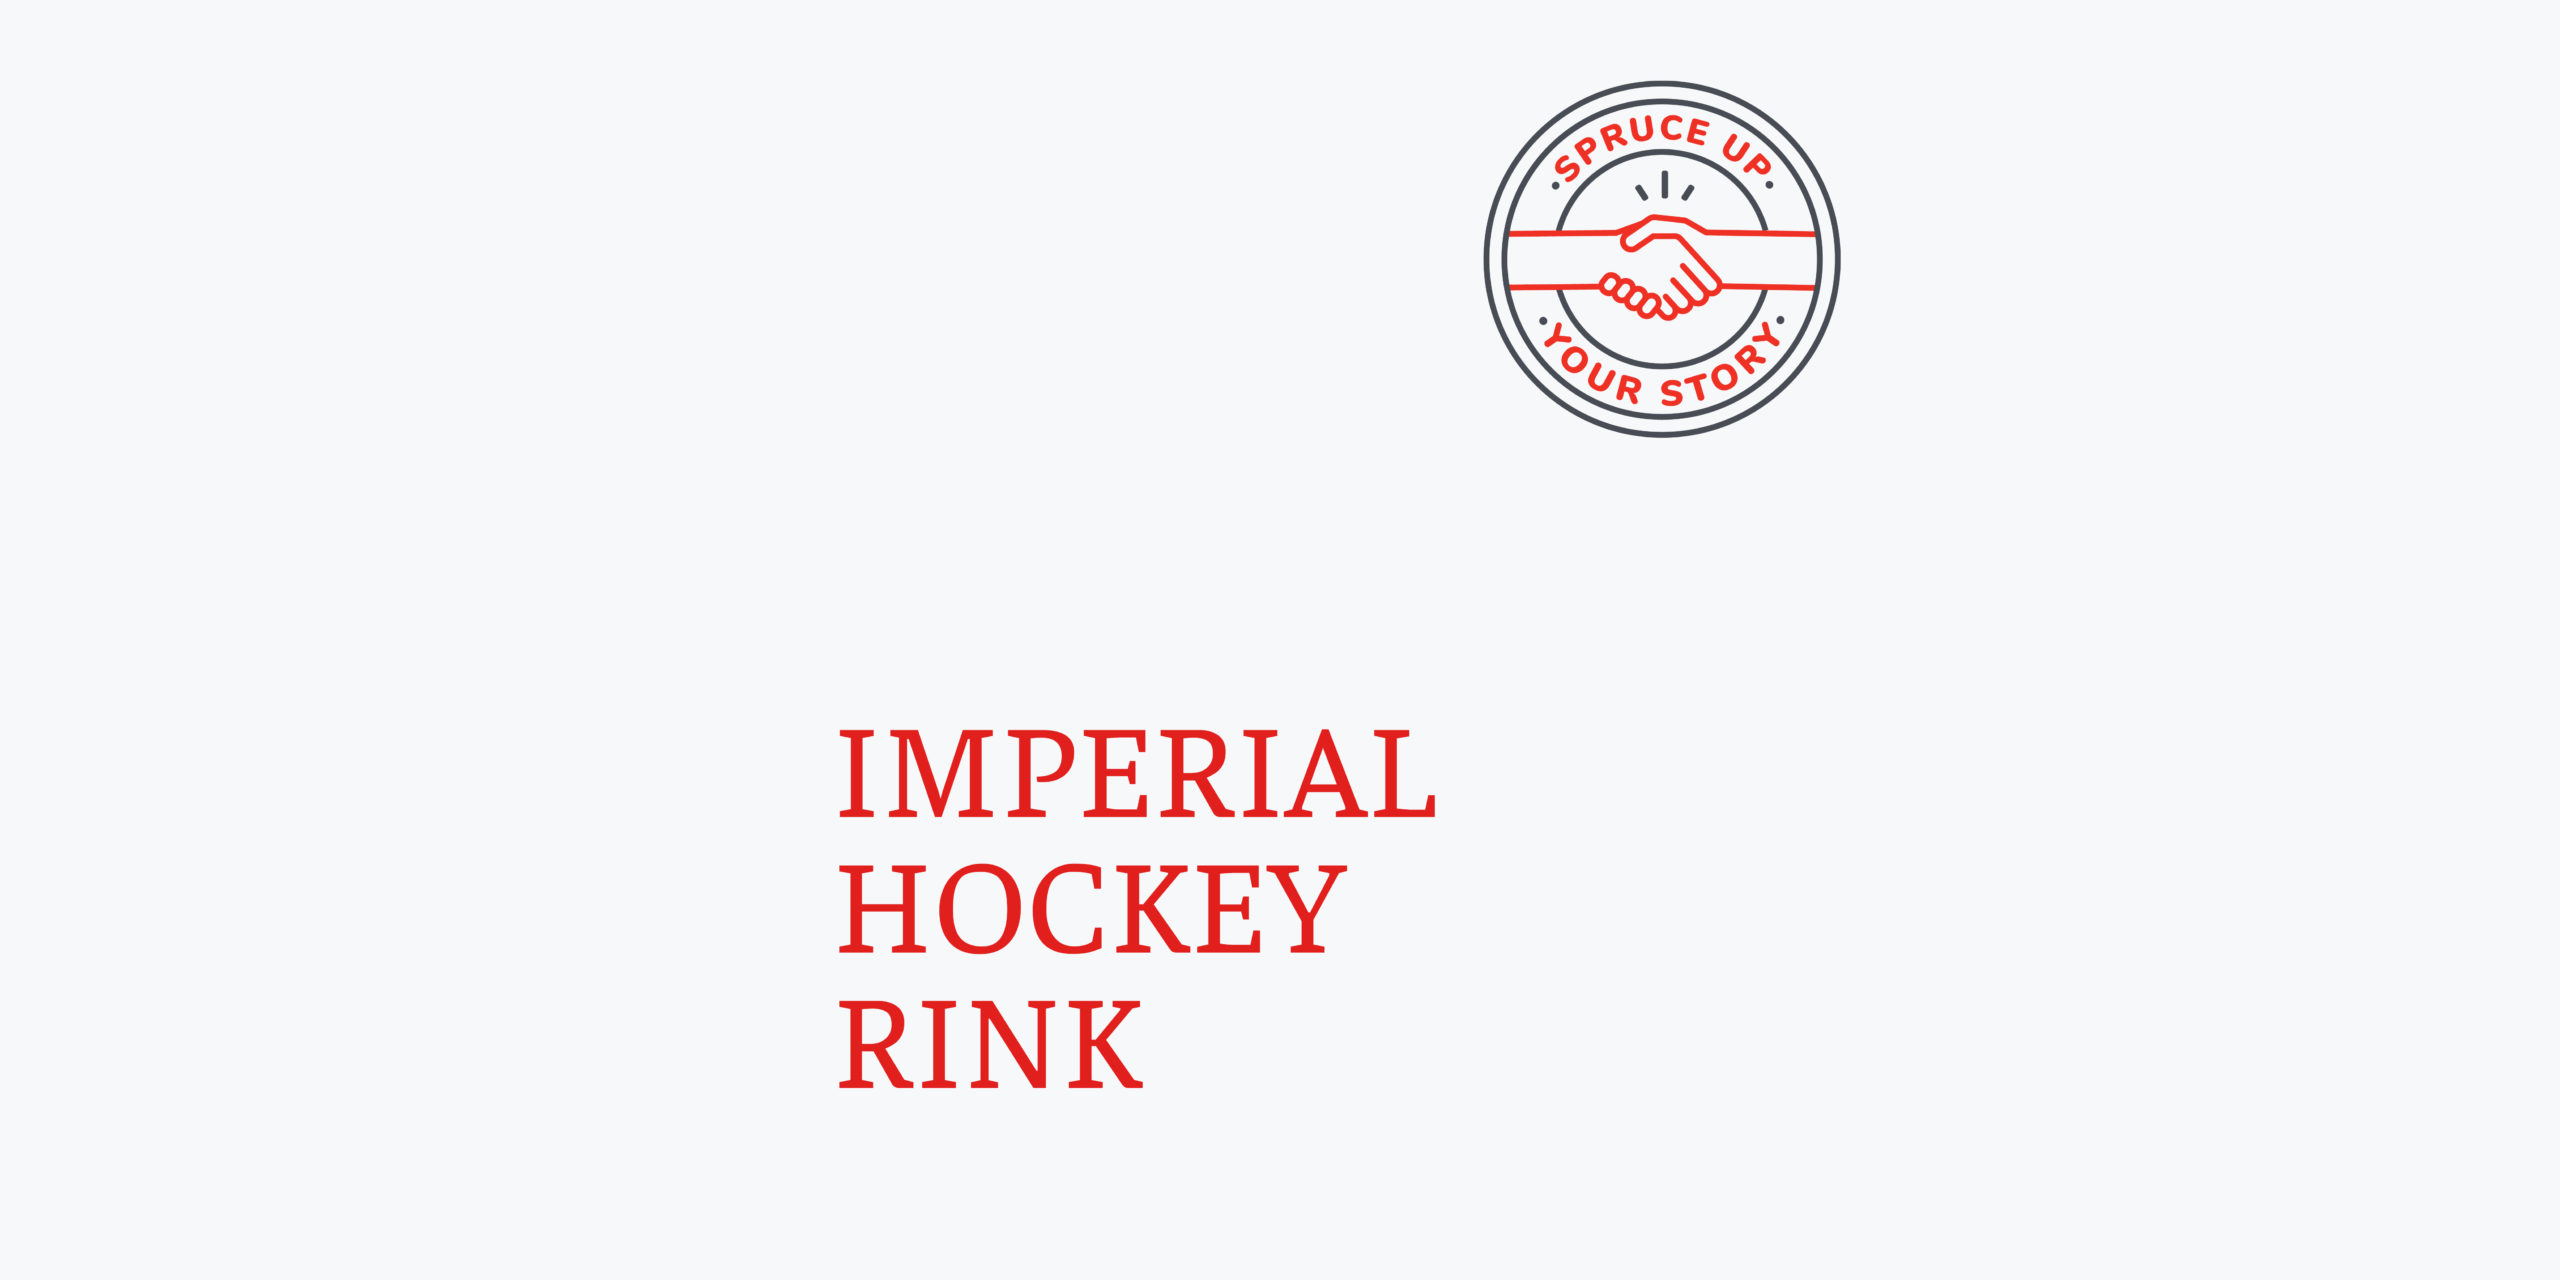 Imperial Hockey Rink